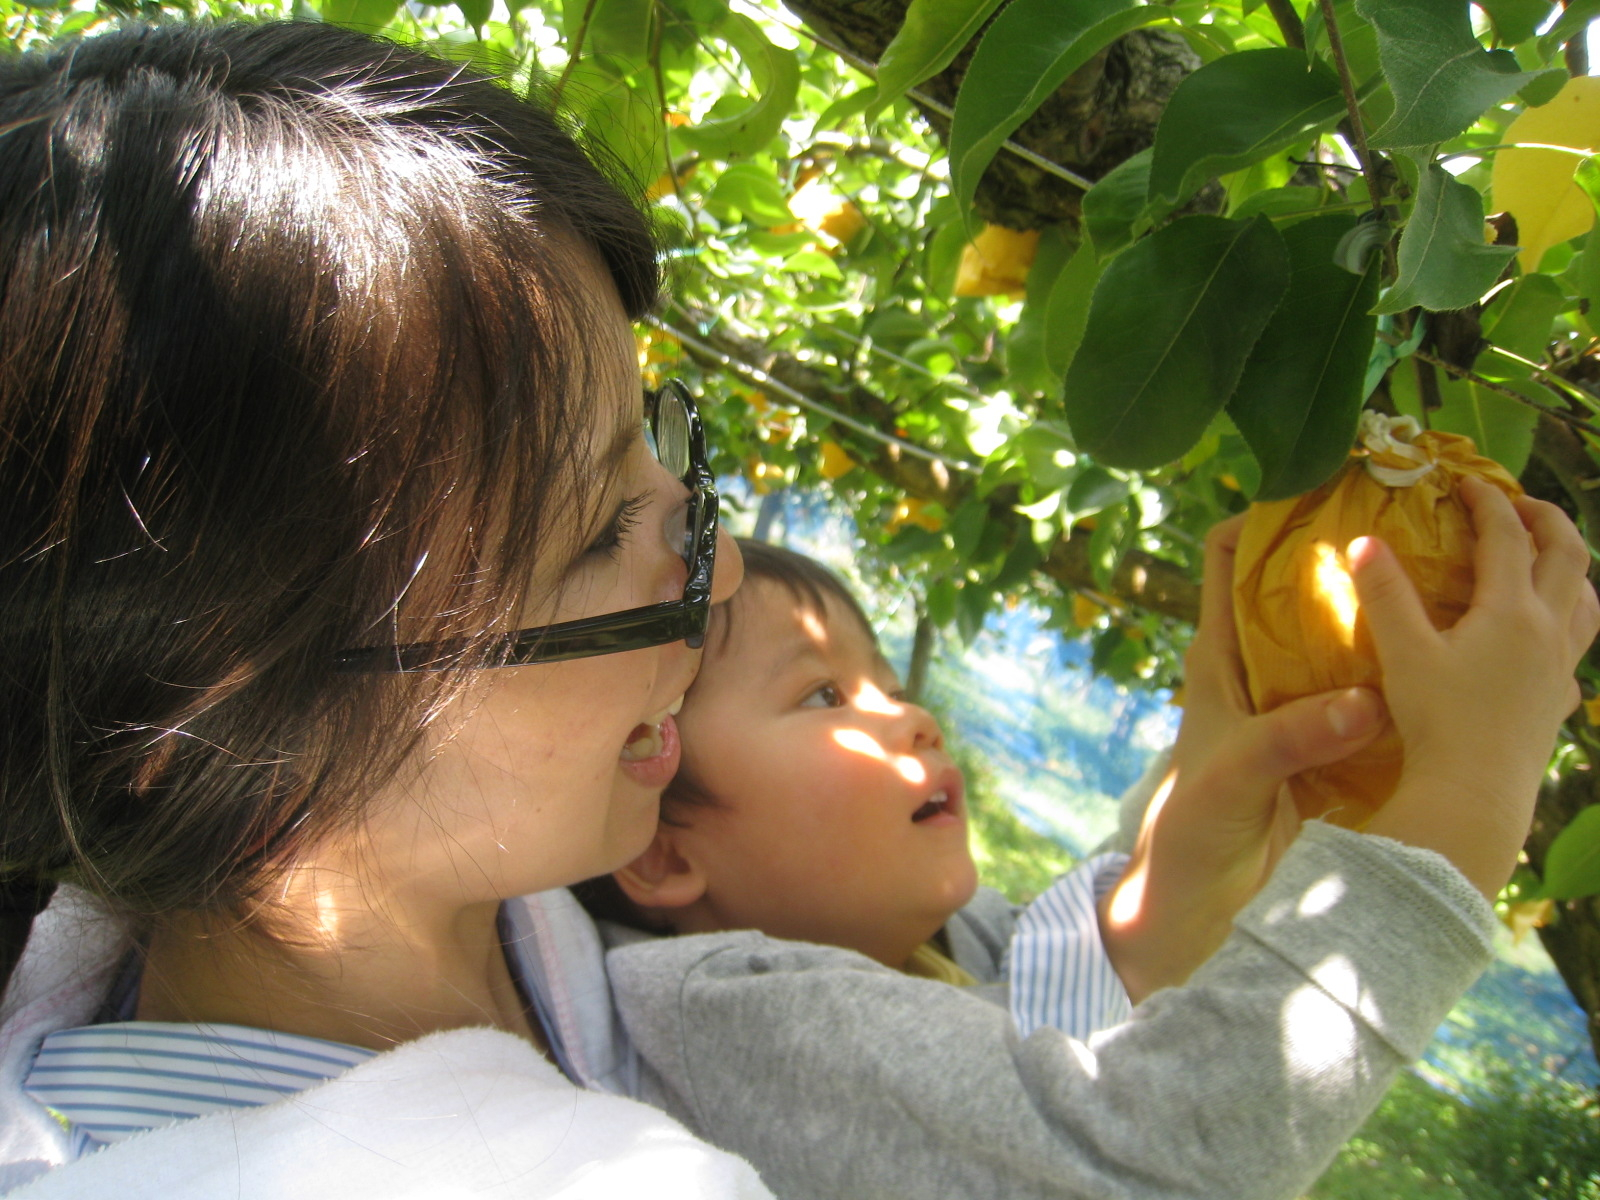 1. Sugane Fruits Land